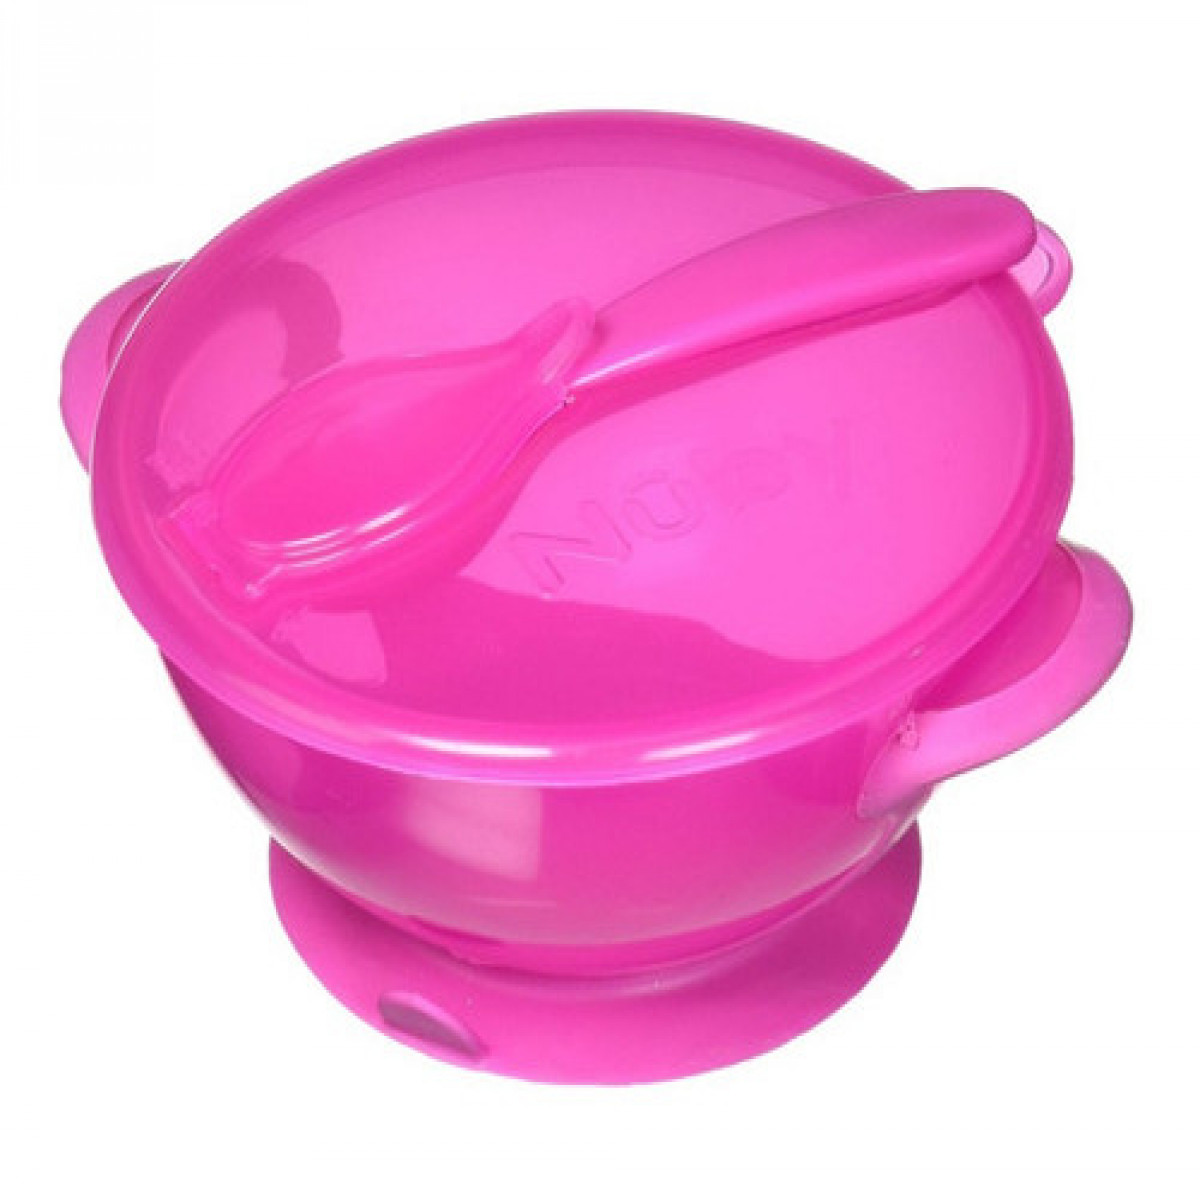 Bowl  con tapa y cuchara Nuby rosa